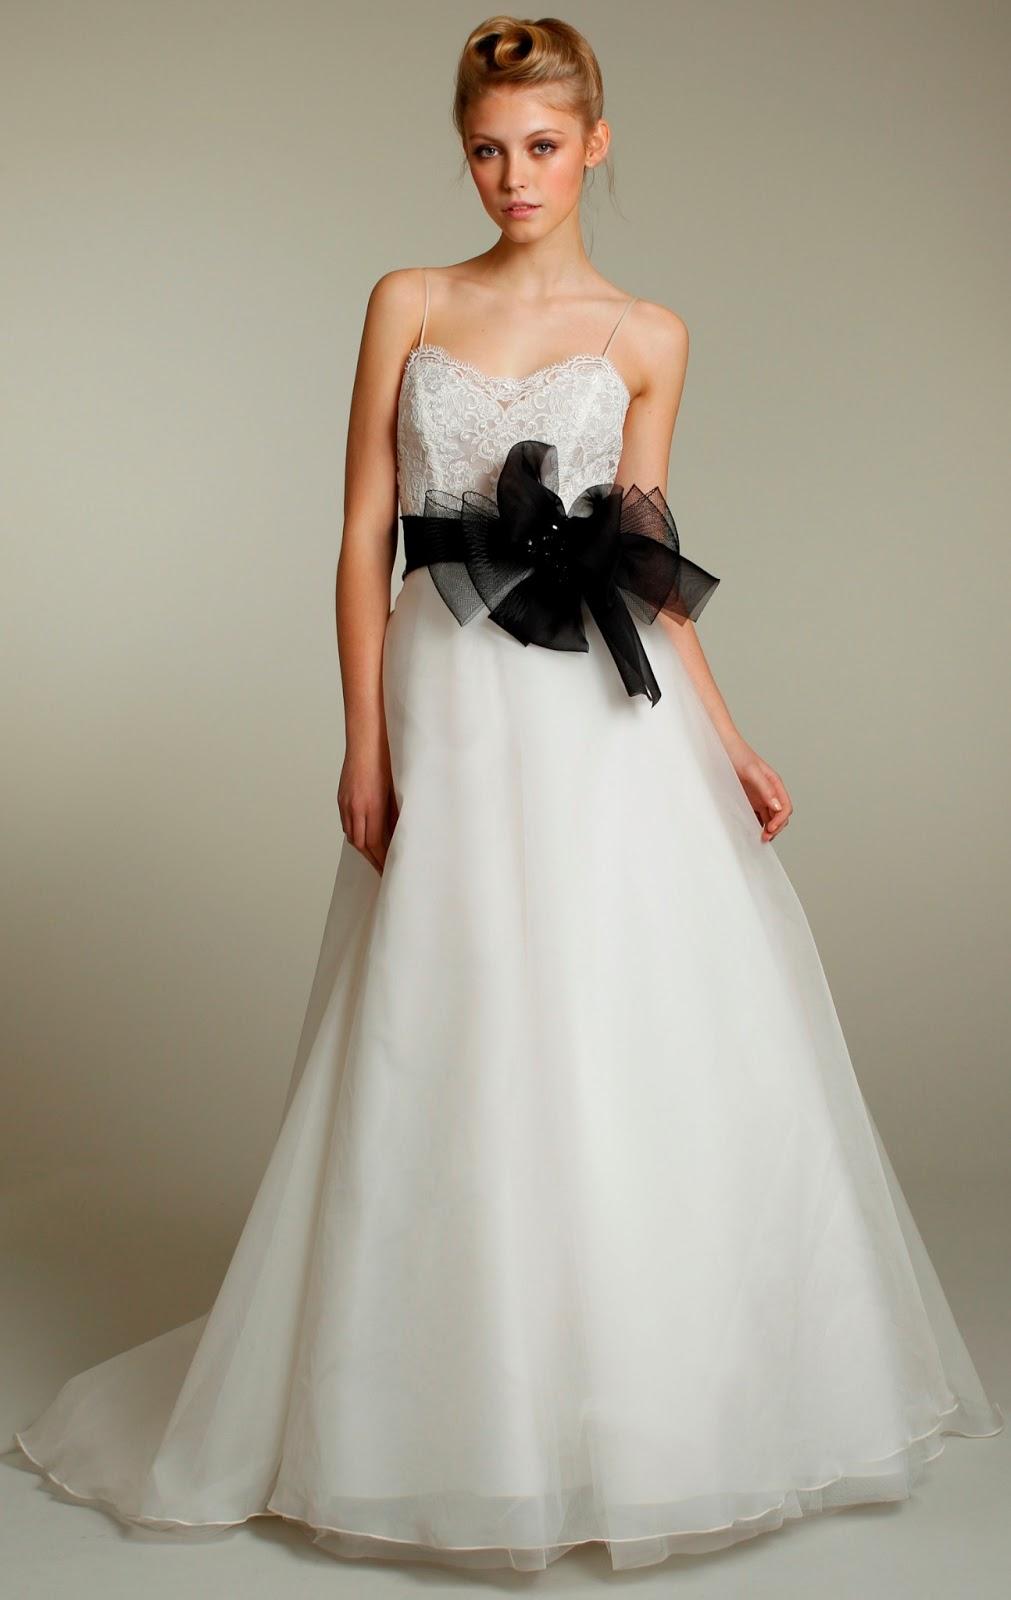 A line+Wedding+Dress+with+Black+Sash+and+Spaghetti+Straps - Wedding Dress Sash